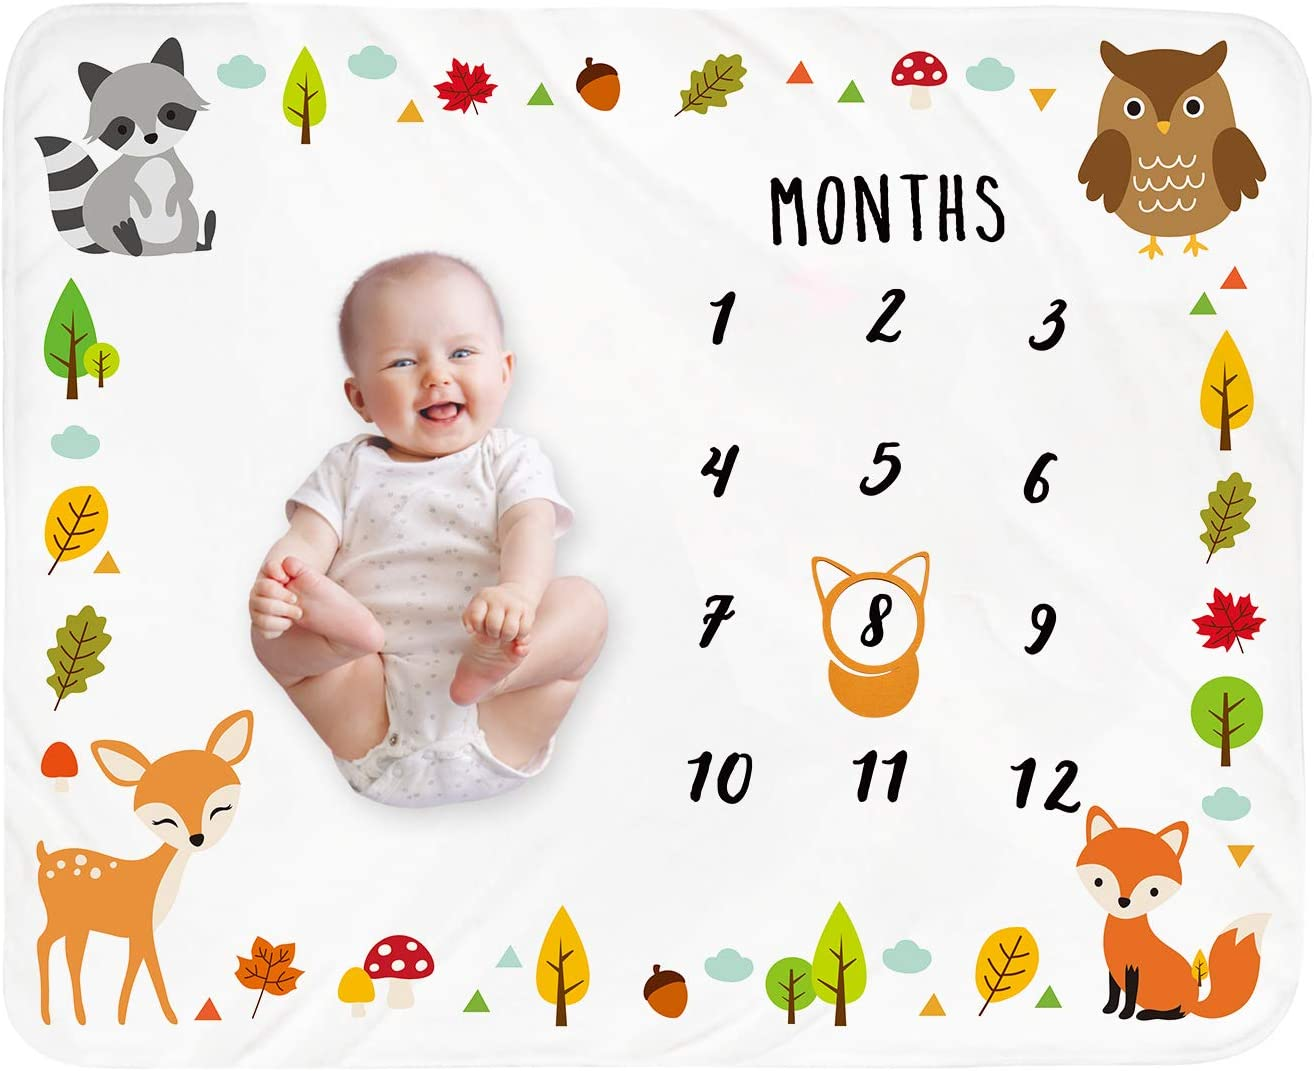 Baby Monthly Milestone Blanket Woodland - Newborn Month Blanket Unisex Neutral Personalized Shower Gift Woodland Animals Nursery Decor Photography Background Prop with Frame Large 51''x40''